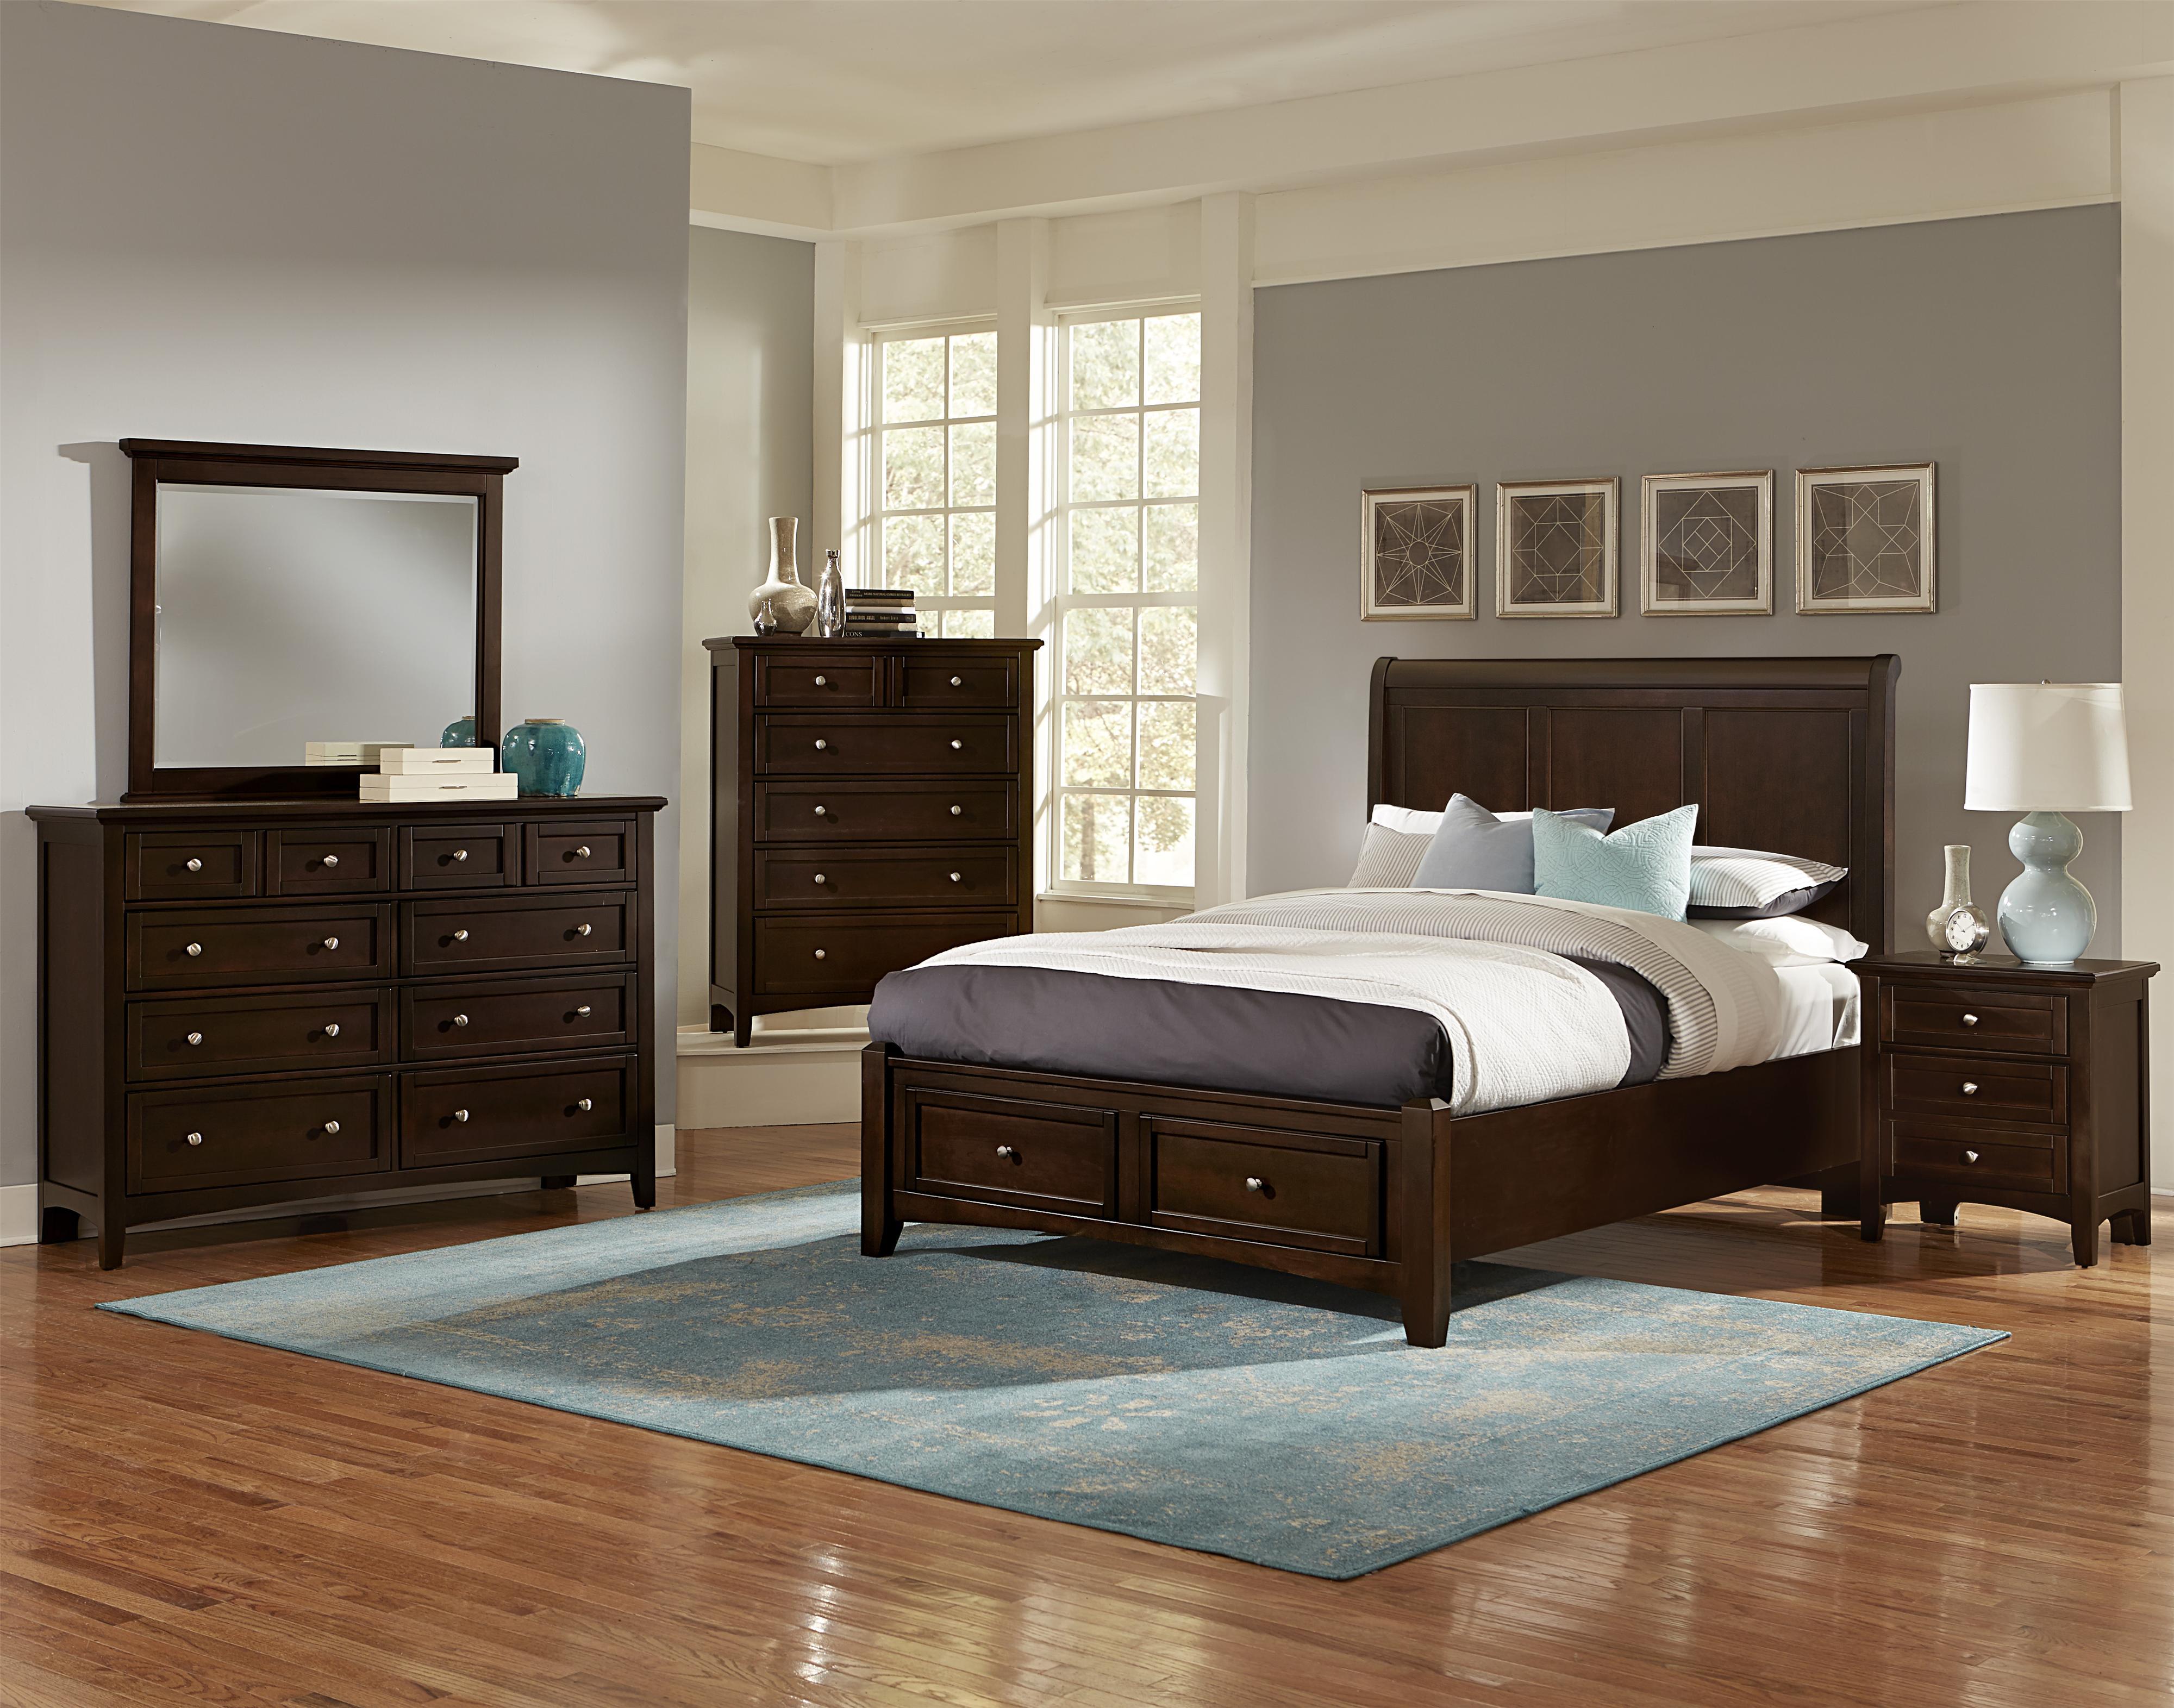 Vaughan Bassett Bonanza Casual Triple Dresser 8 Drawers Prime Brothers Furniture Dressers